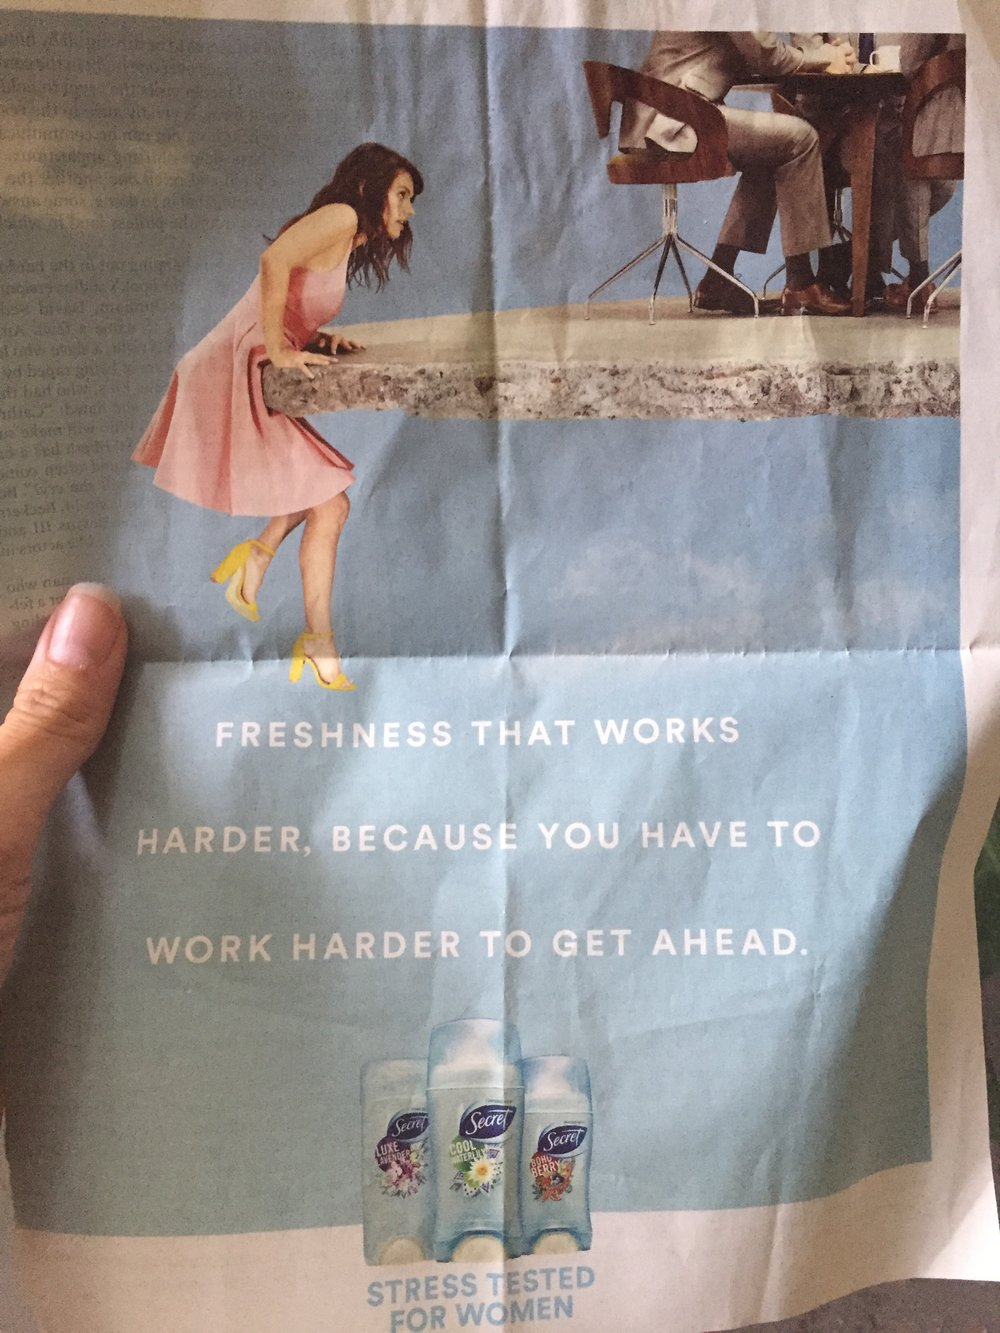 Just a normal advertisement. It's no secret.